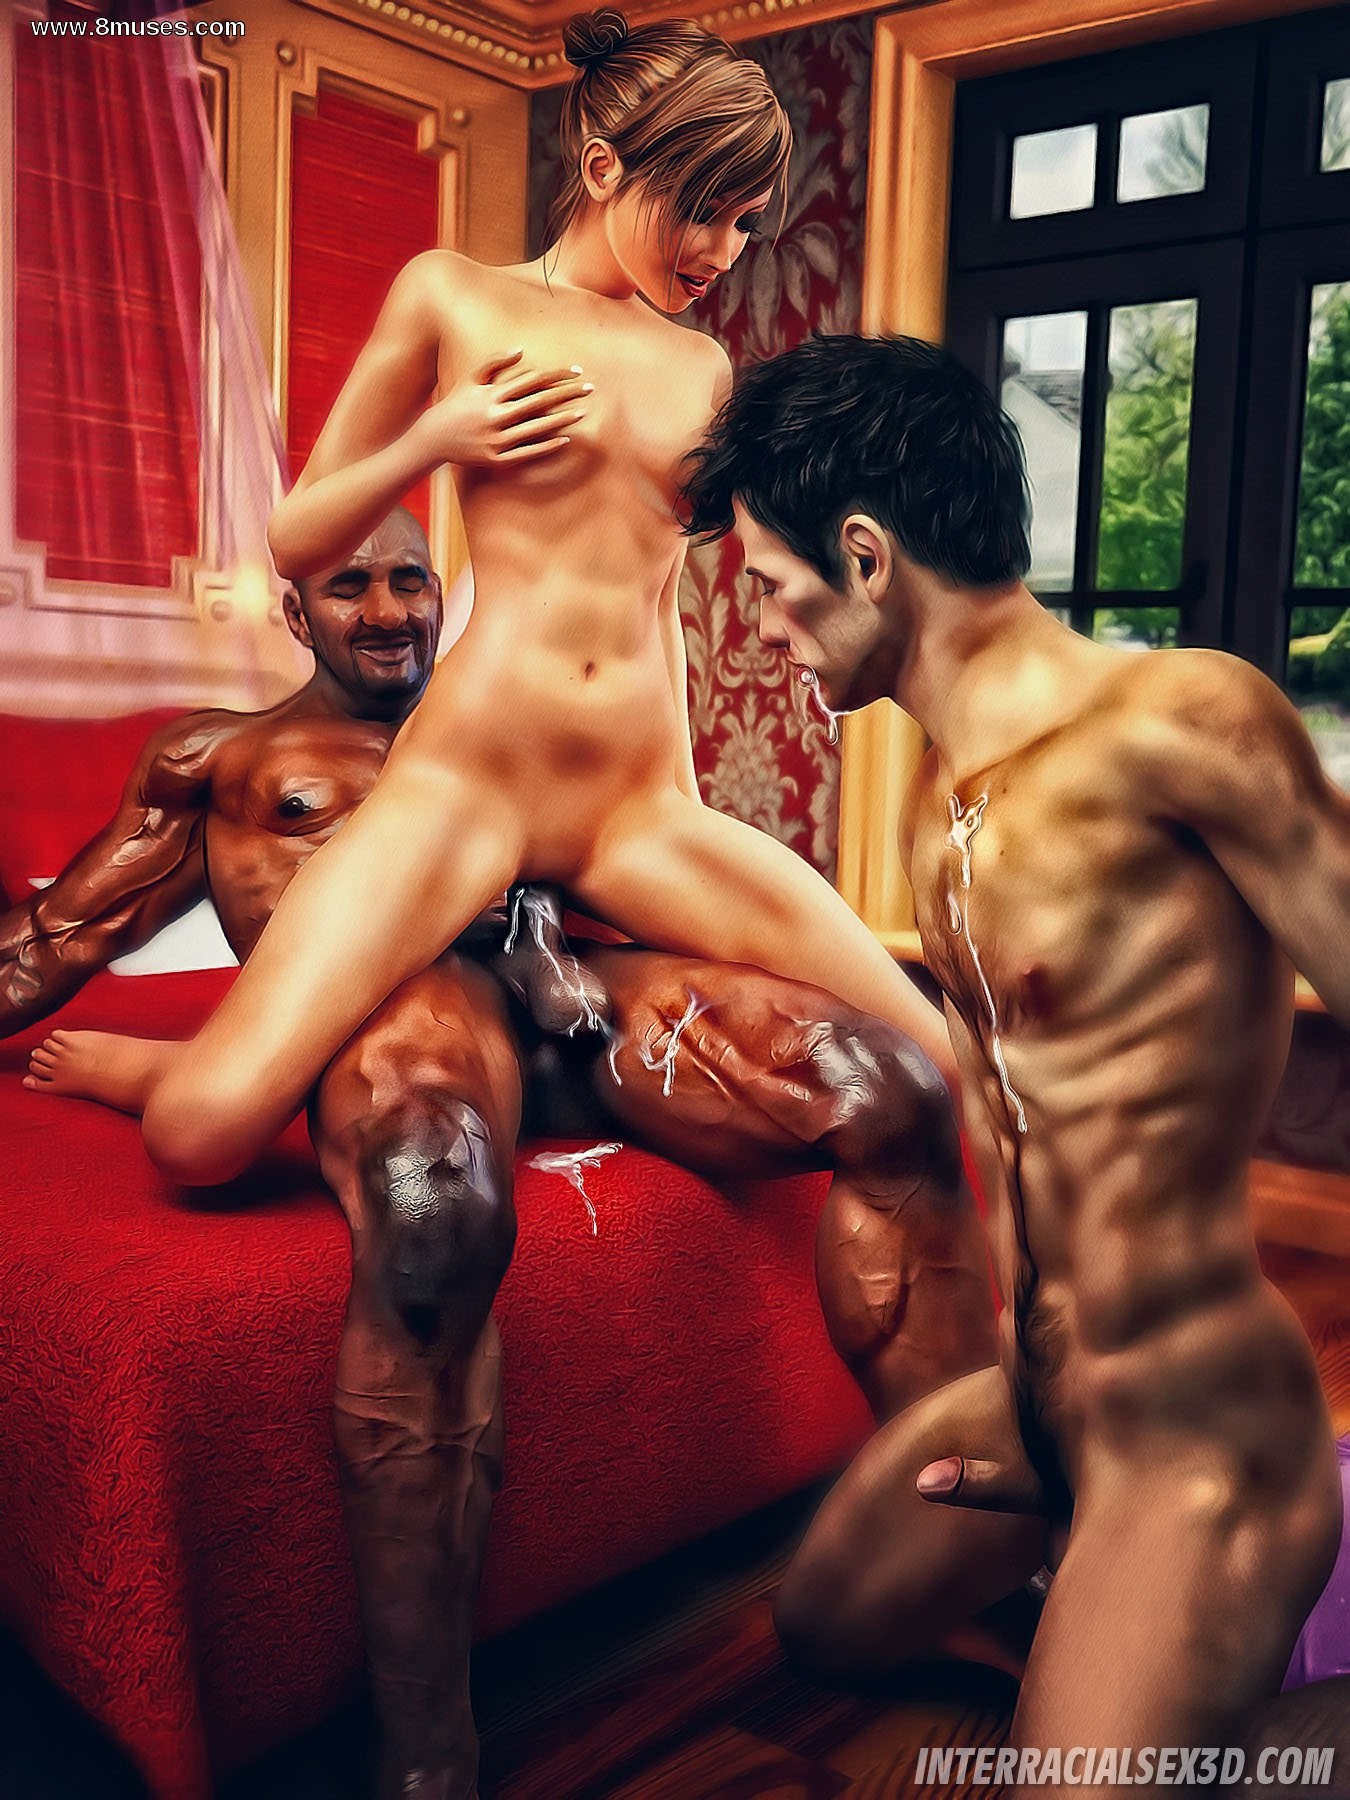 Wife sex fantasy posts — 12